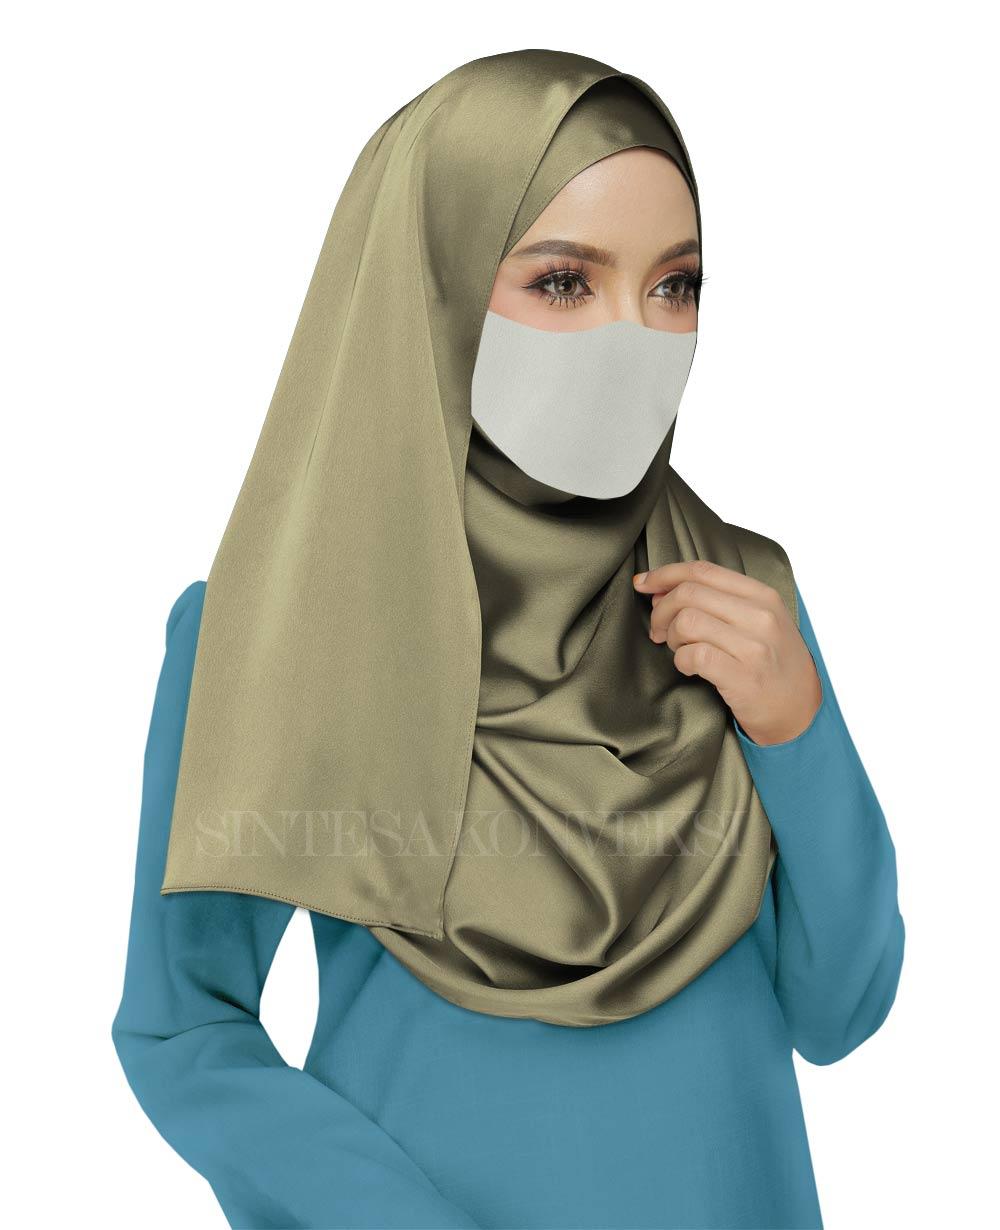 Baju Biru Muda Cocok dengan Jilbab Warna Apa